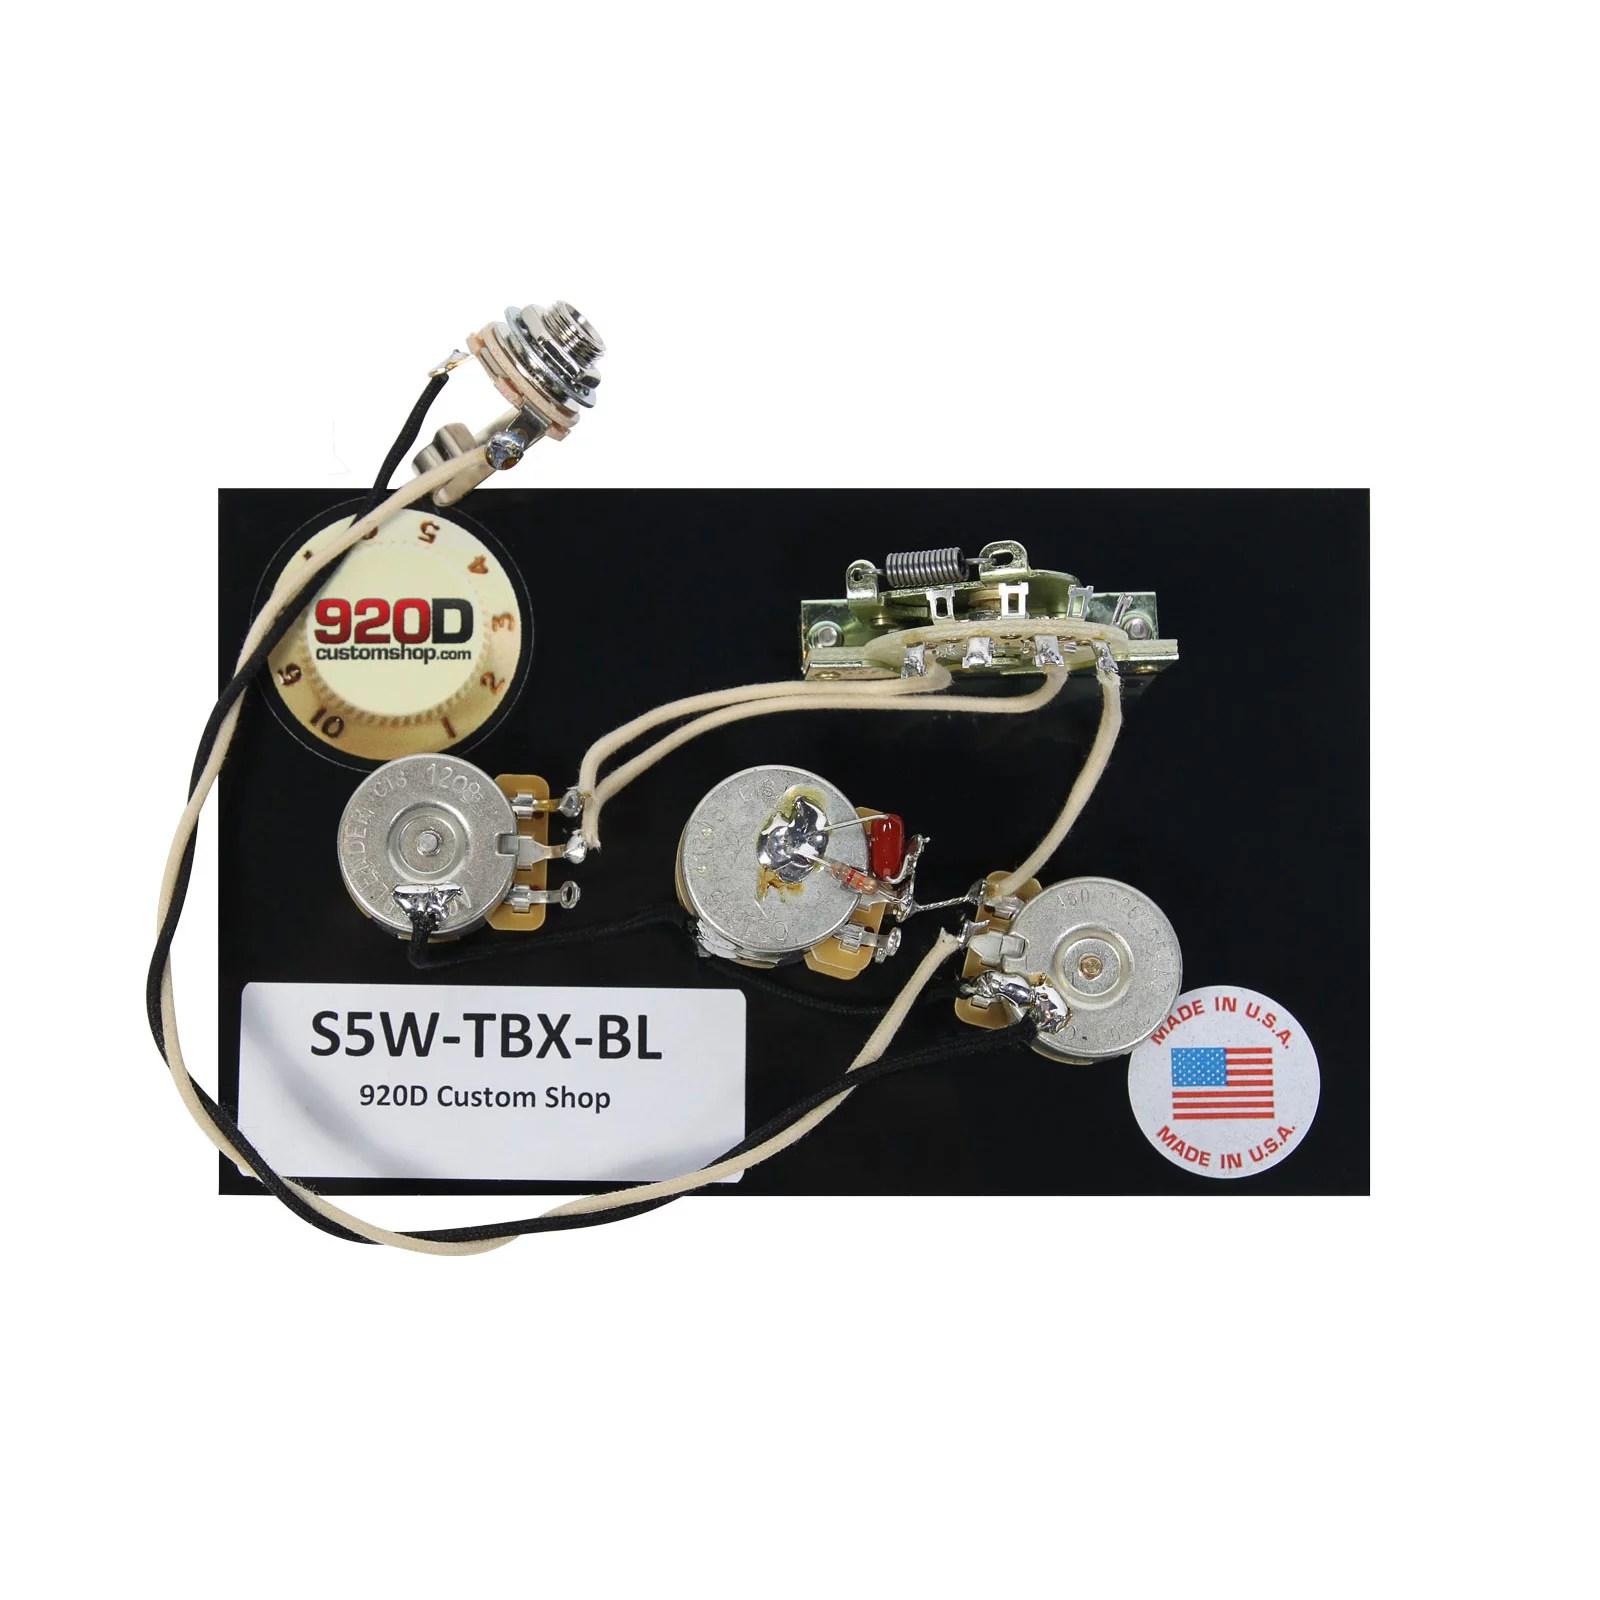 hight resolution of 920d fender strat stratocaster wiring harness tbx and blender pot